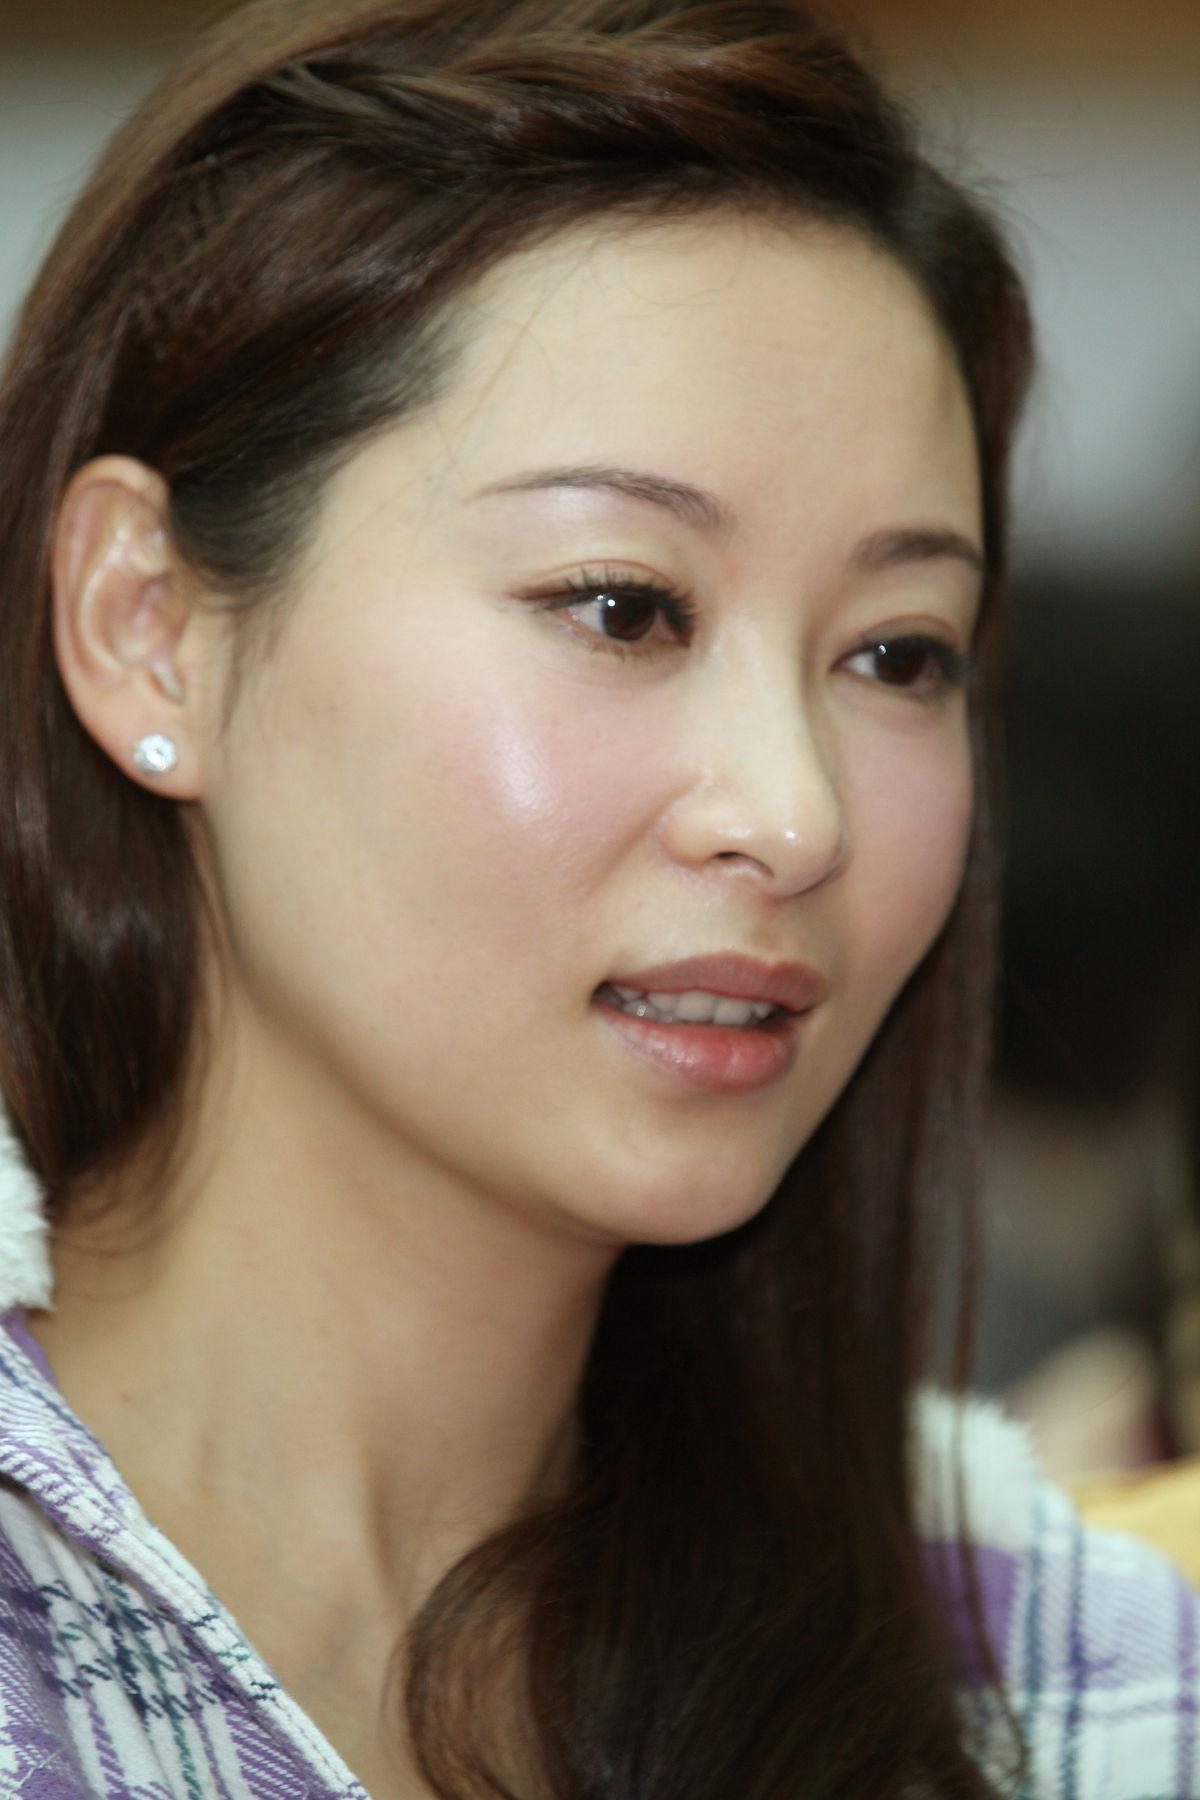 Hong kong celebrity nude photo